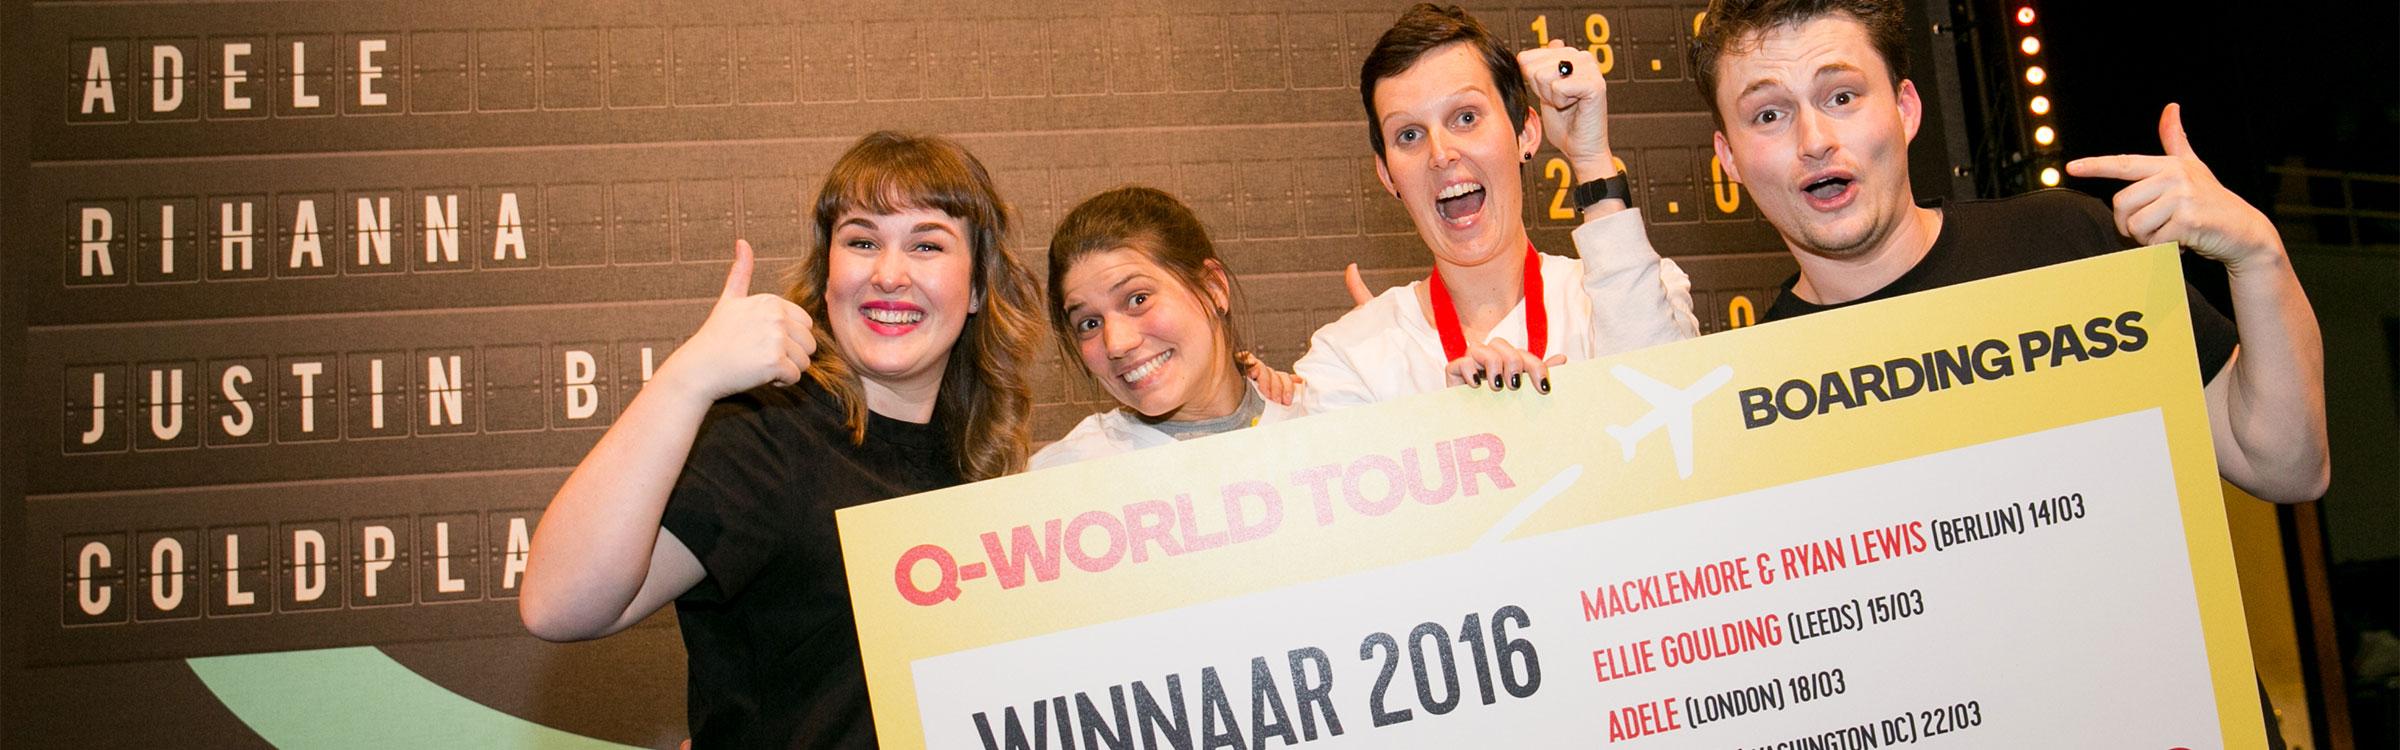 Qworldtour page